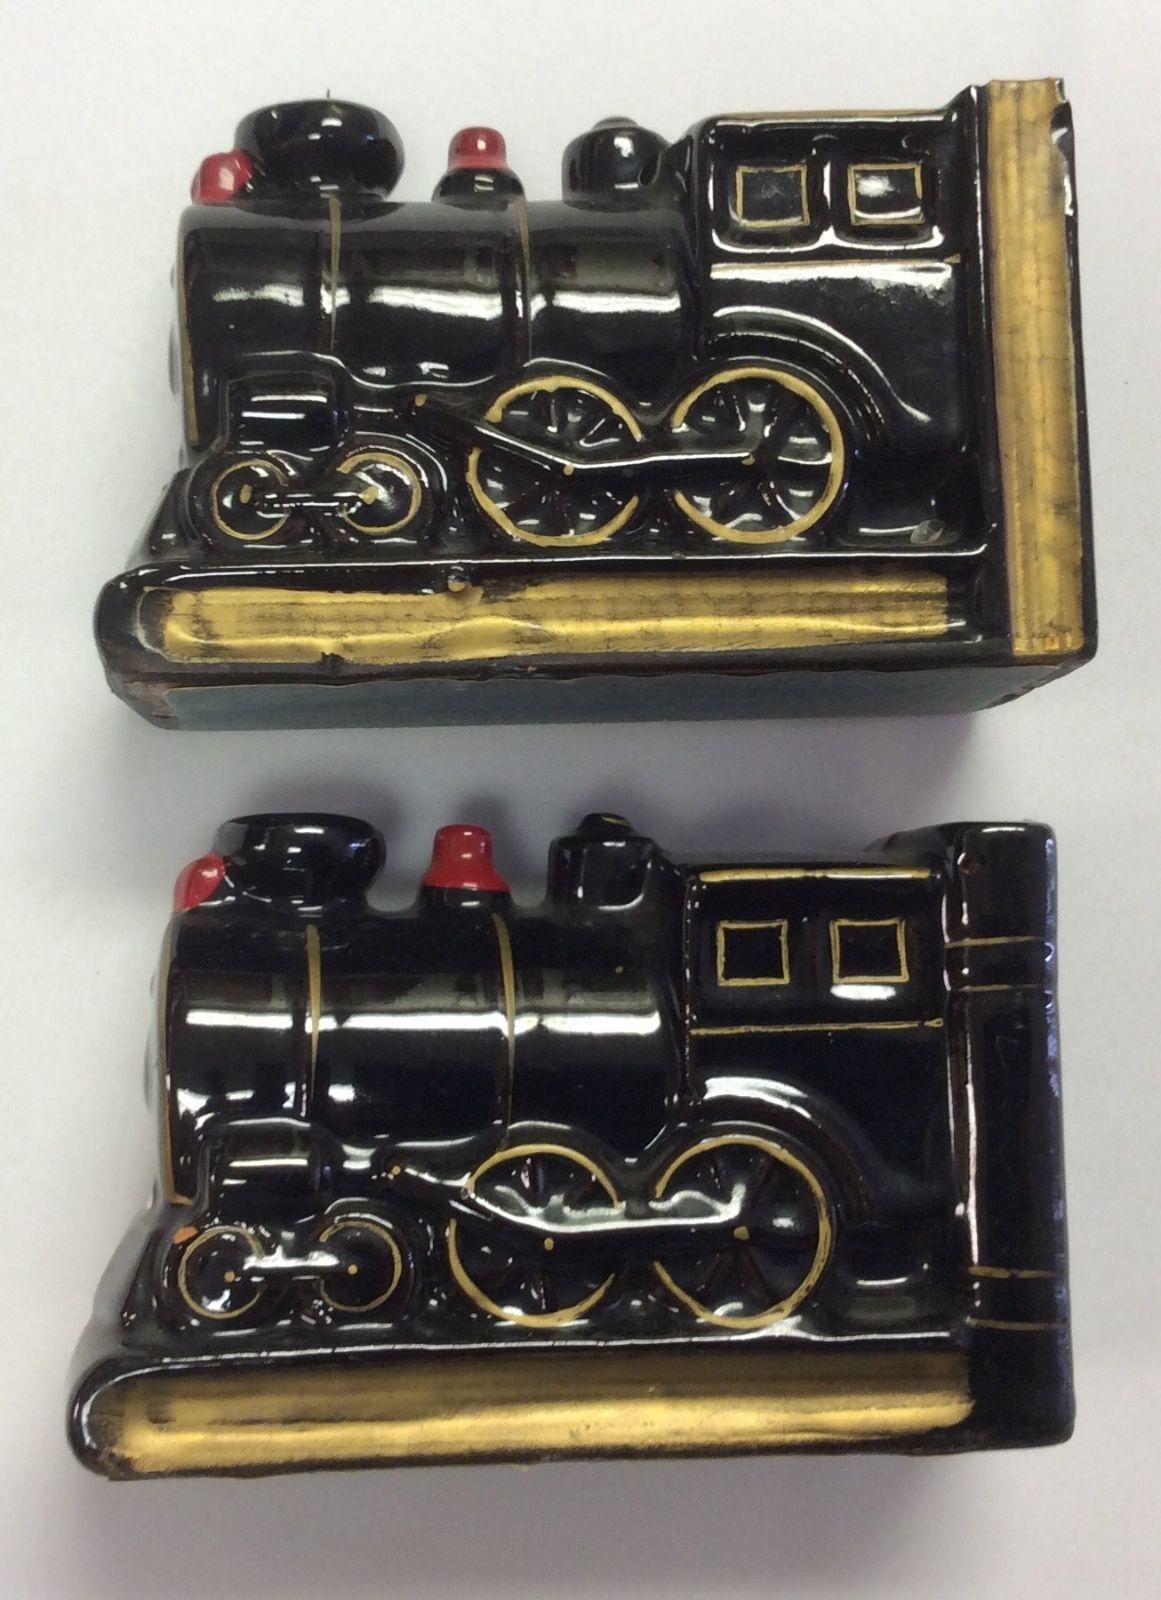 Vintage Japan Black Ceramic Train Locomotive Bookends Desk Set Of 2 Stop Brake Switch Ac Or Dc Wind Turbine Generator Marine Grade Ebay